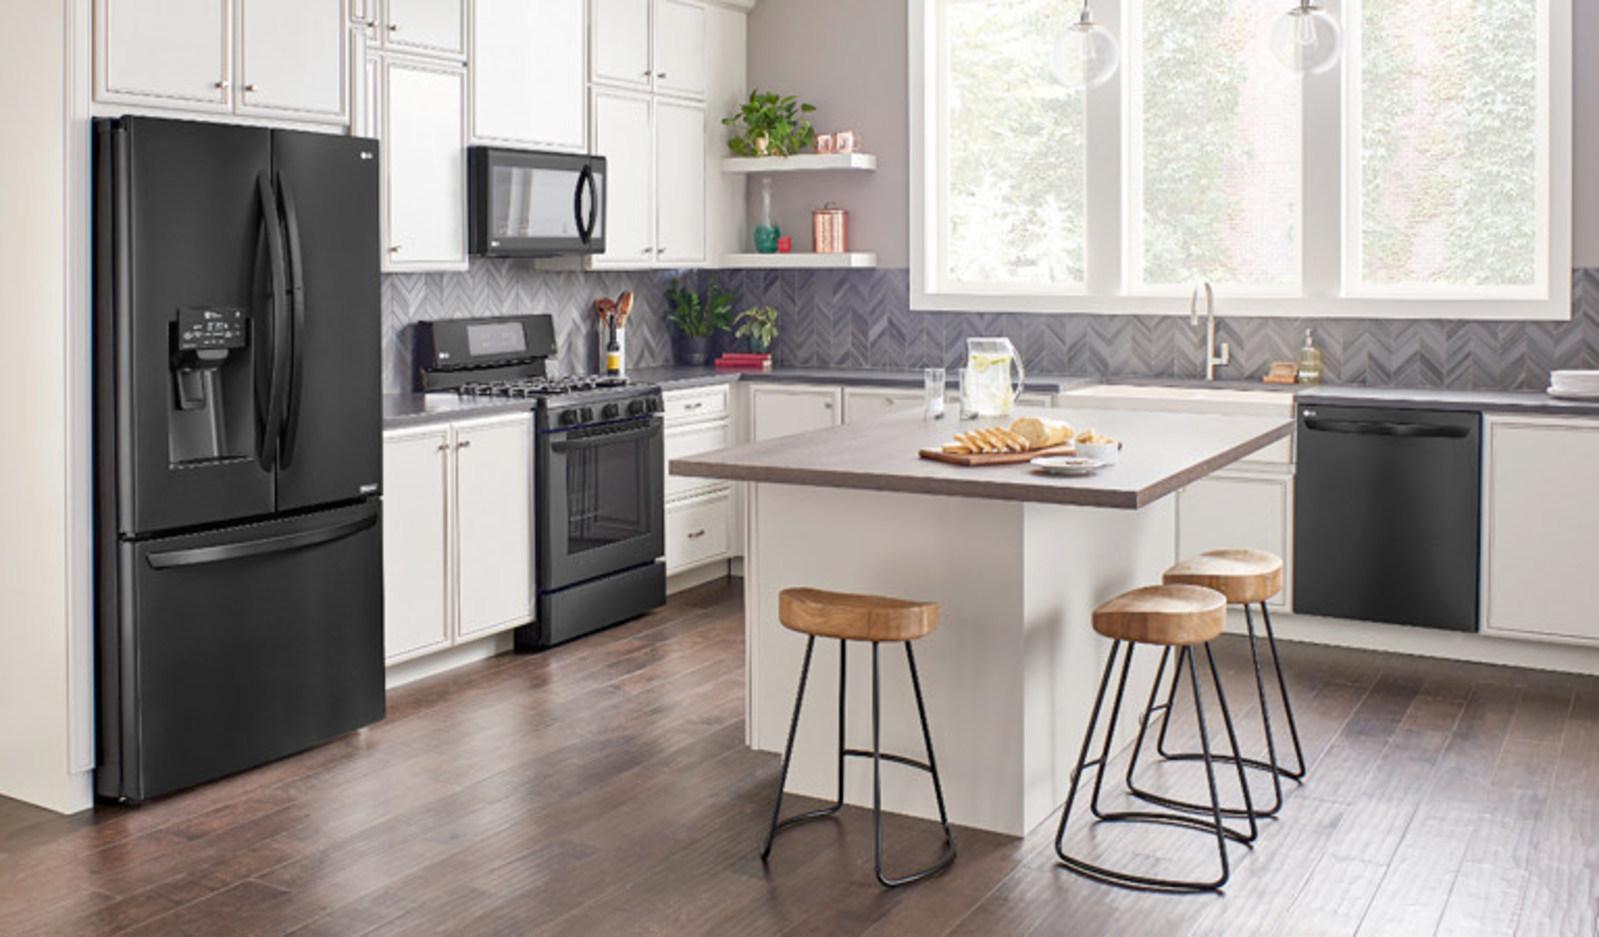 Kitchen Appliances That Work With Alexa